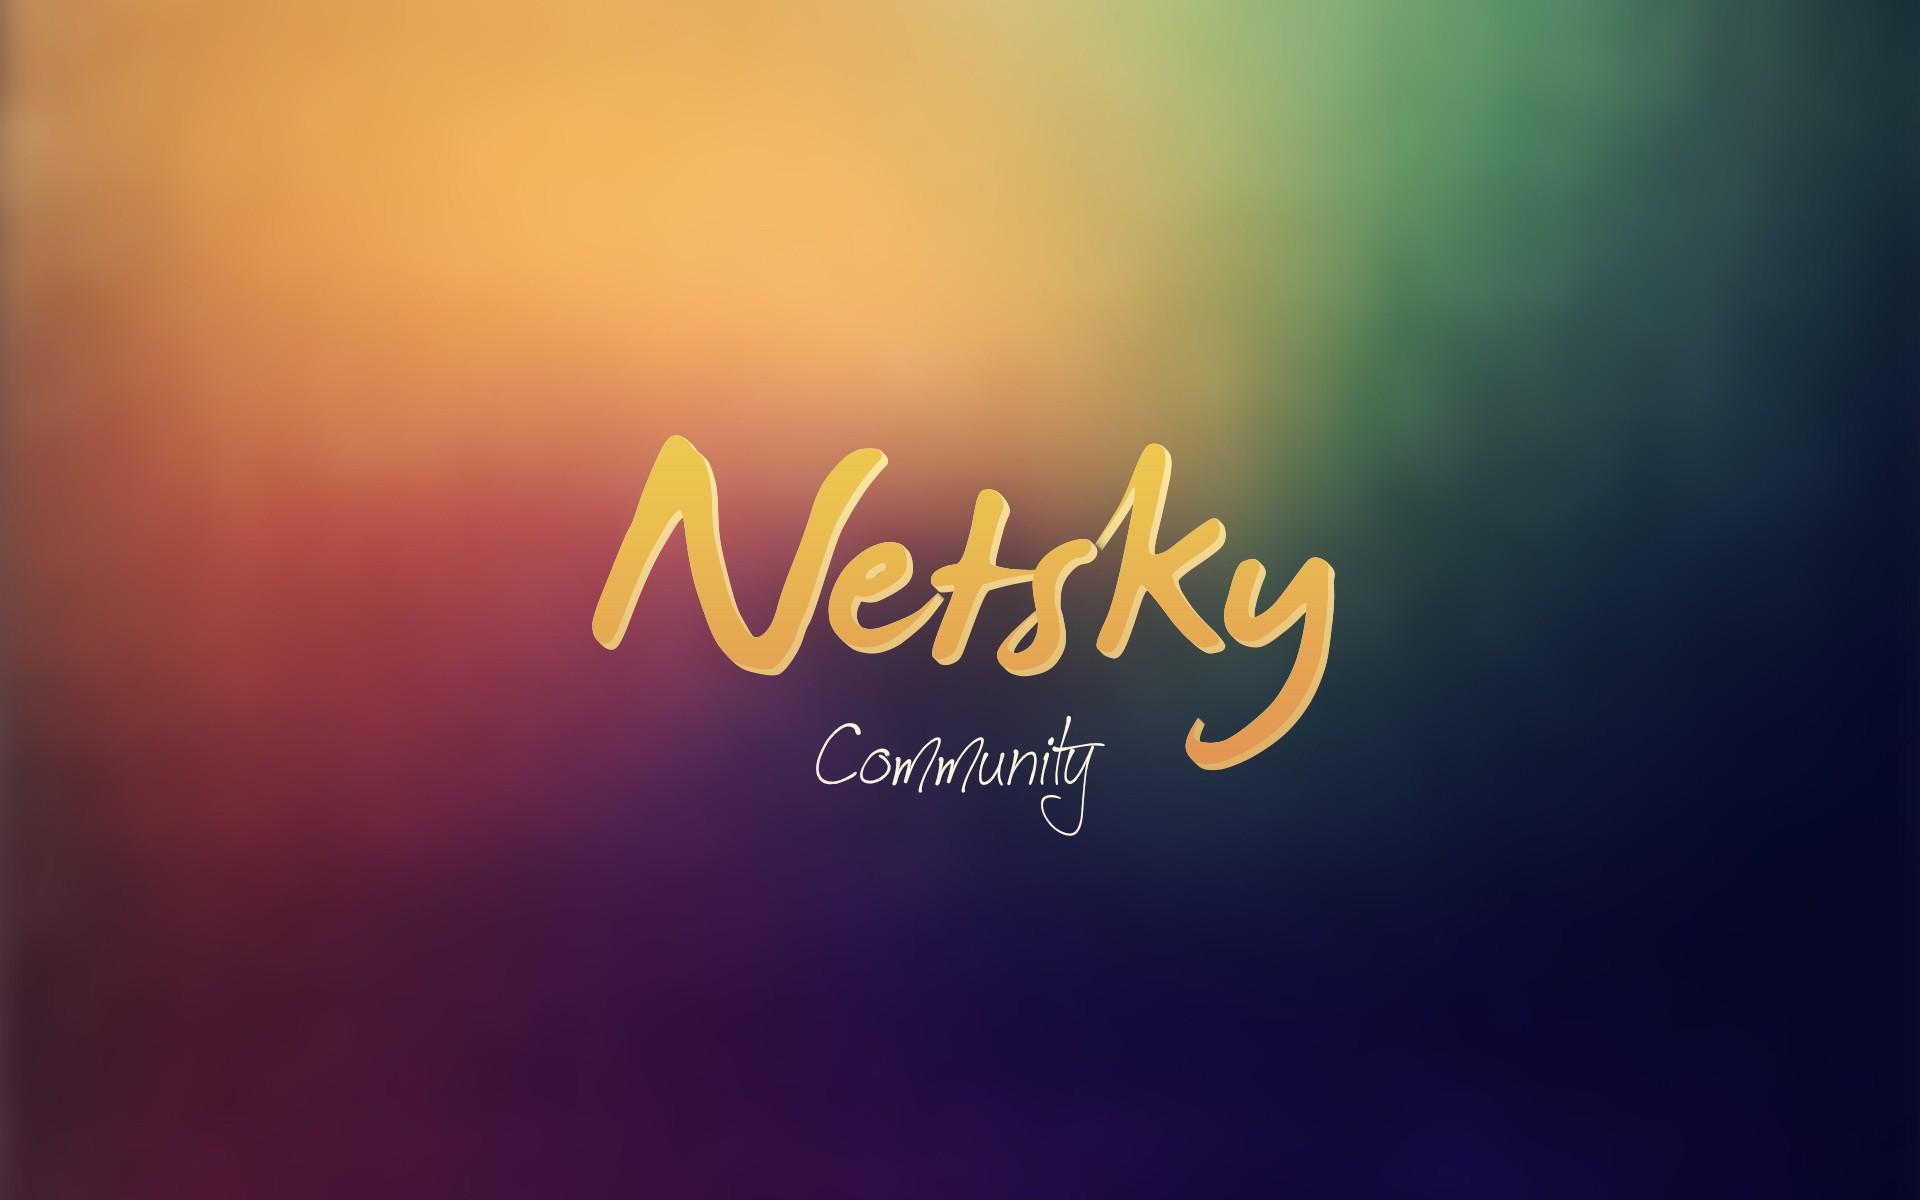 Netsky Wallpapers HD Download 1920x1200